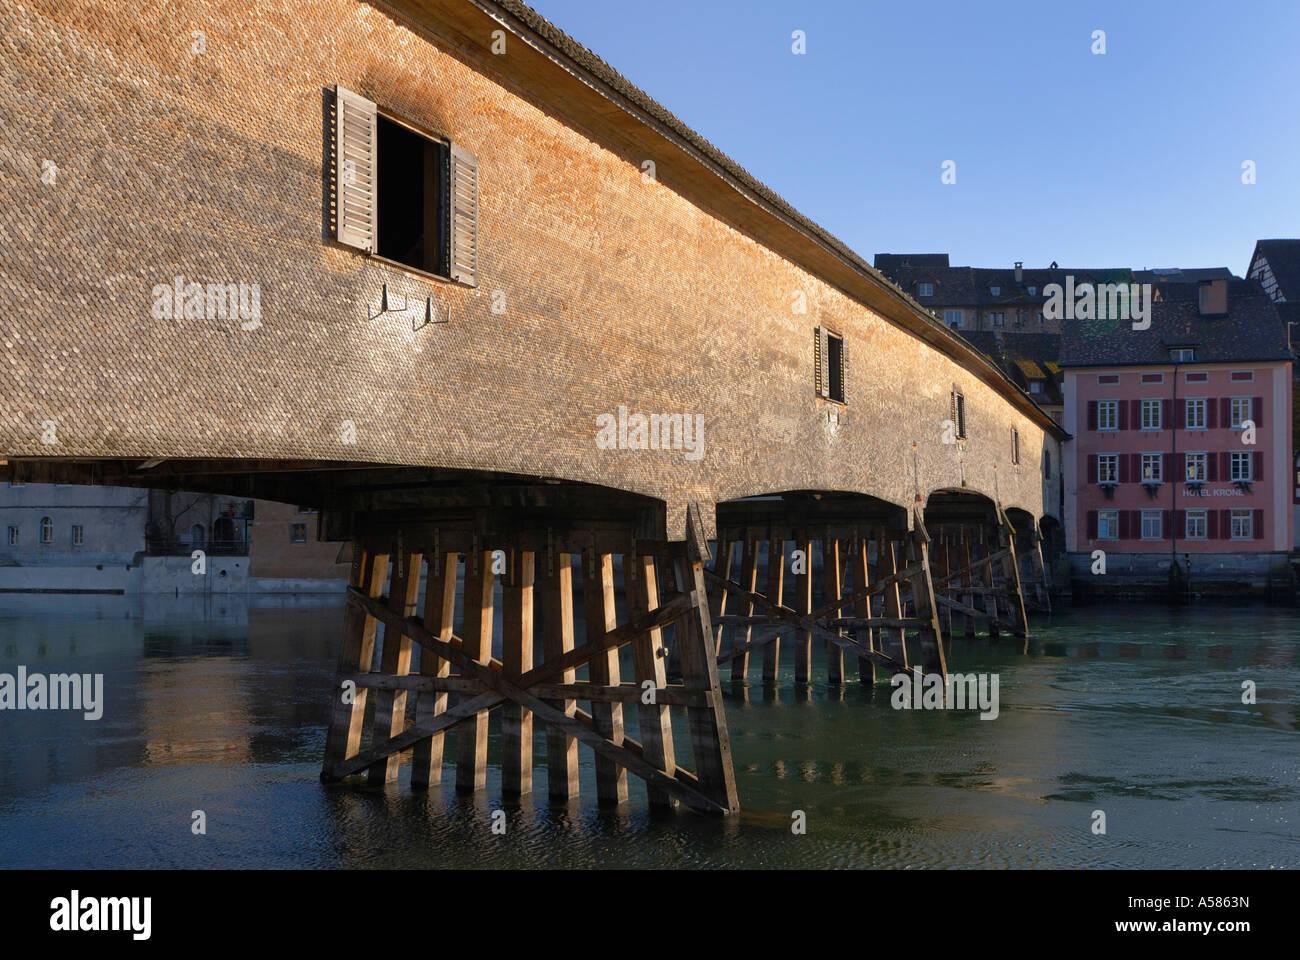 Wodden bridge on the border from Germany-Switzerland - Baden-Wuerttemberg, Germany, Europe Stock Photo